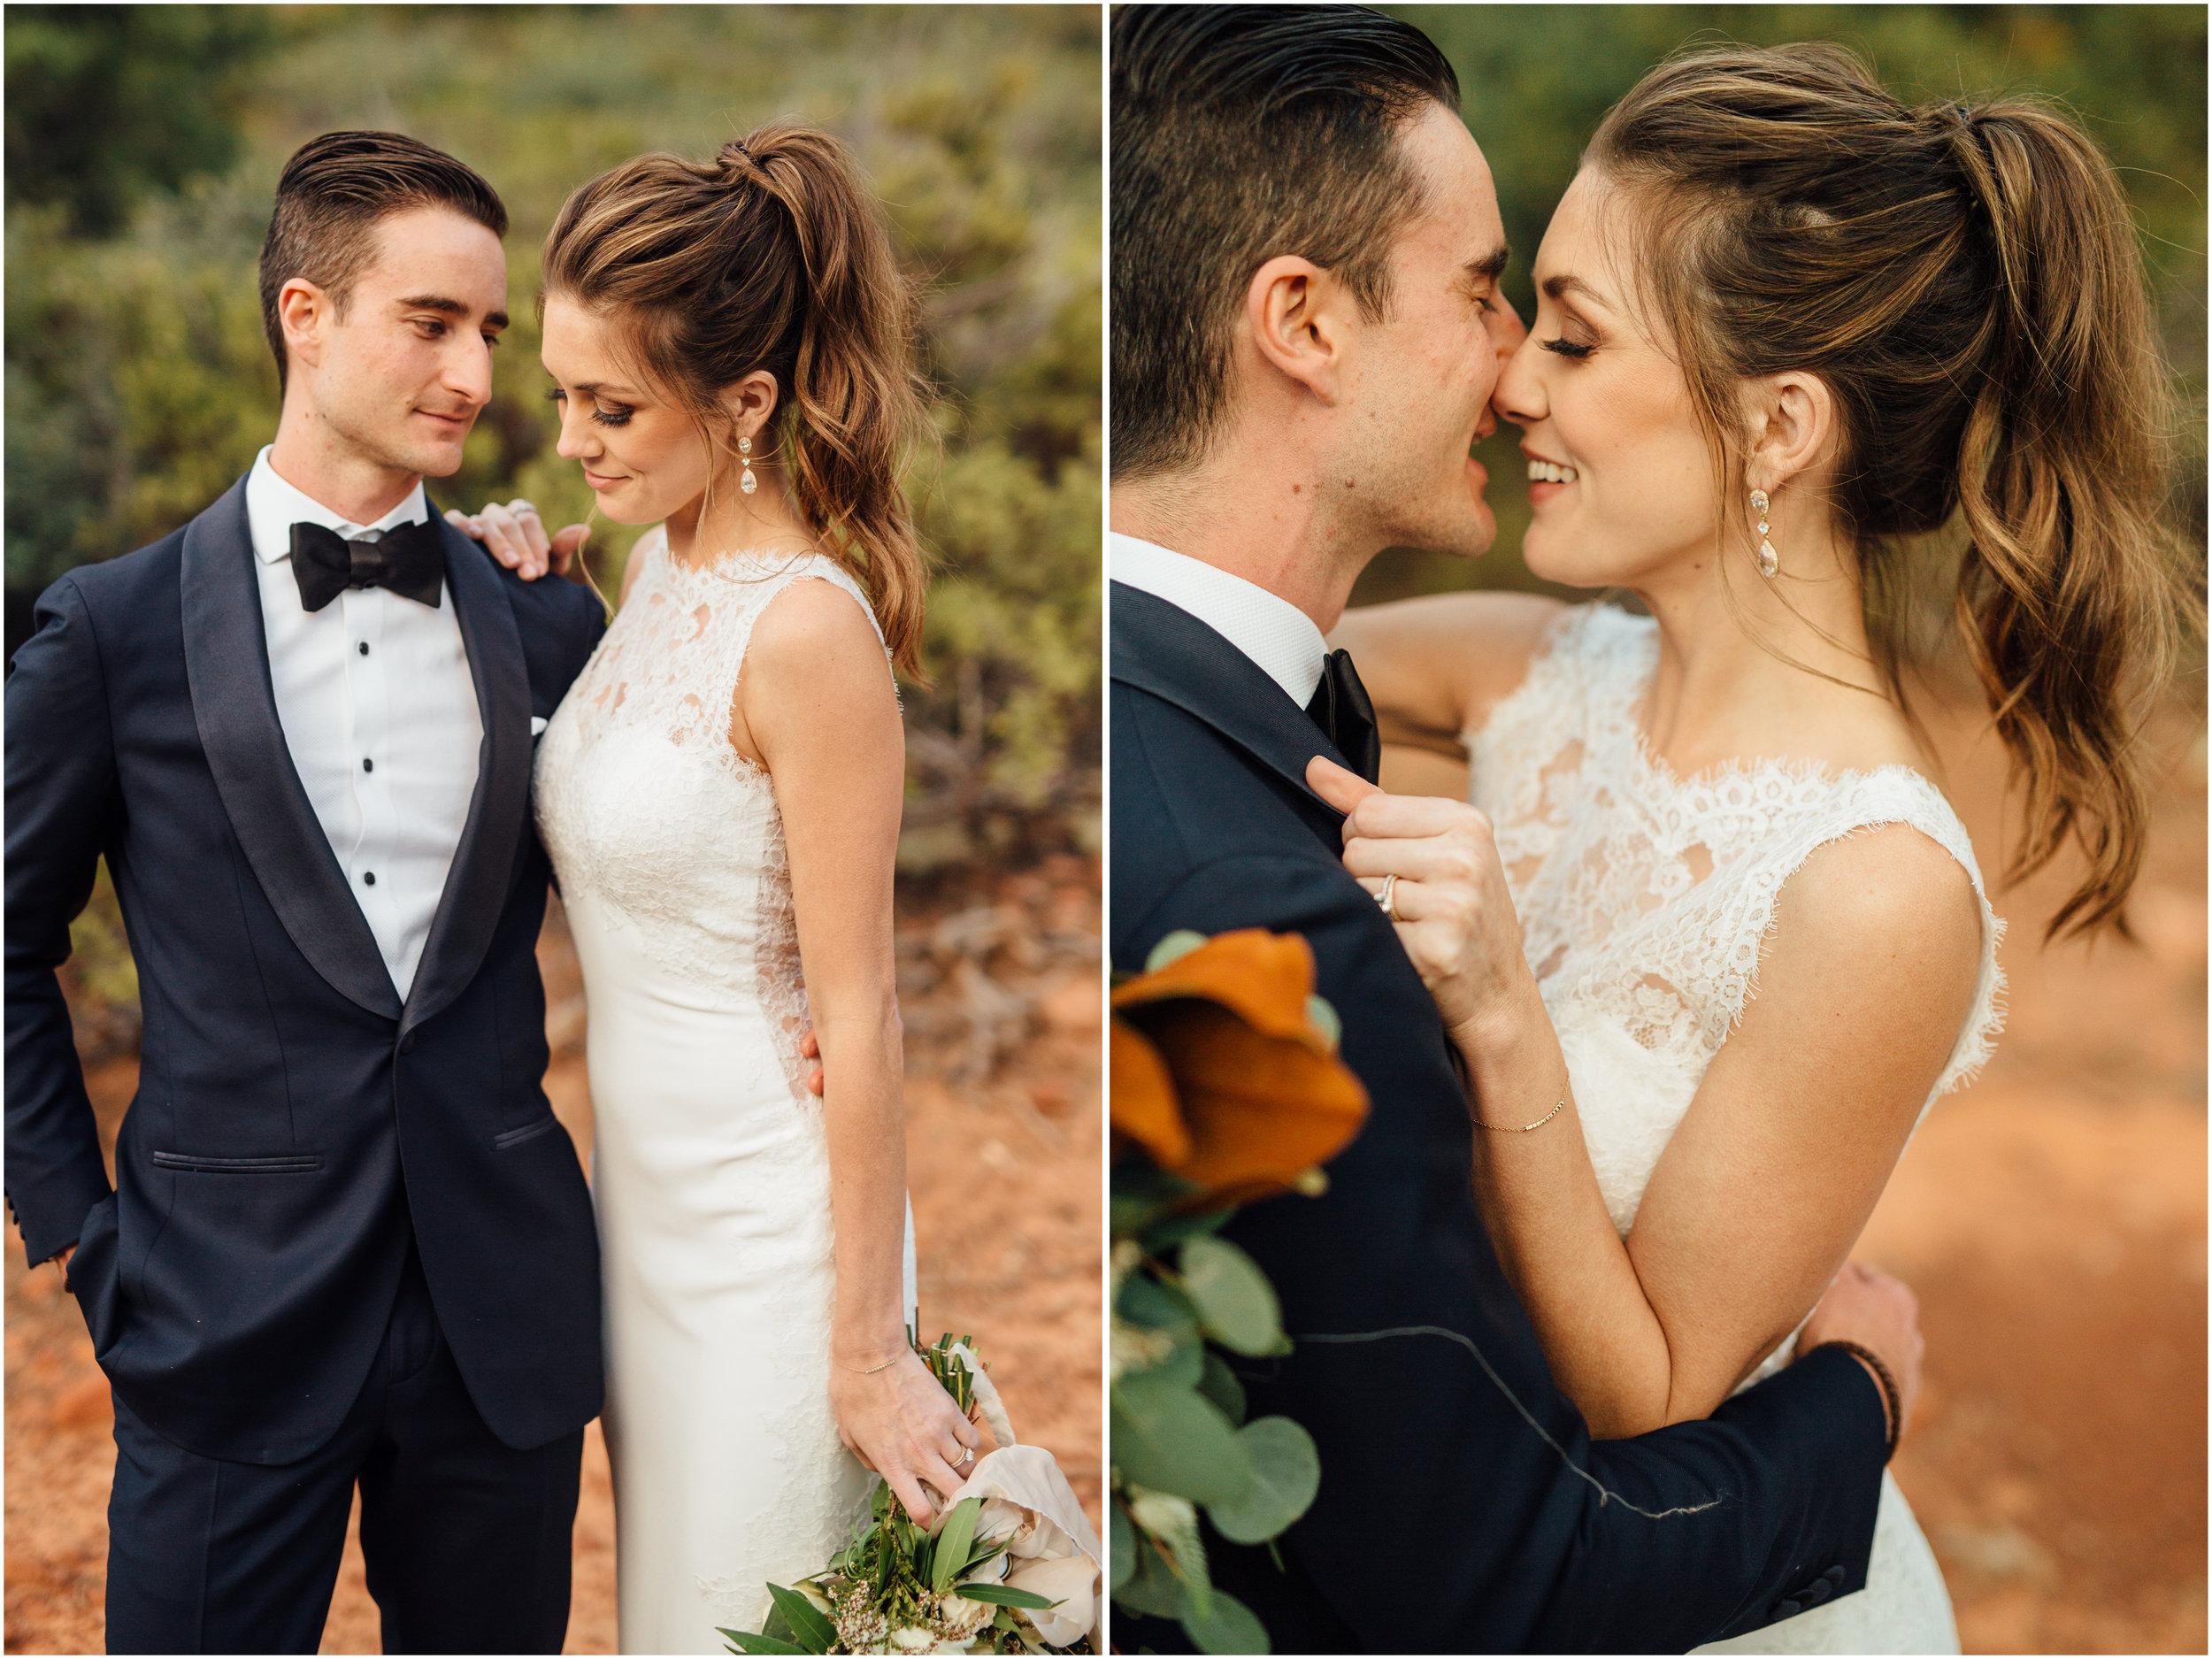 Sedona-enchantment-bride-groom.jpg